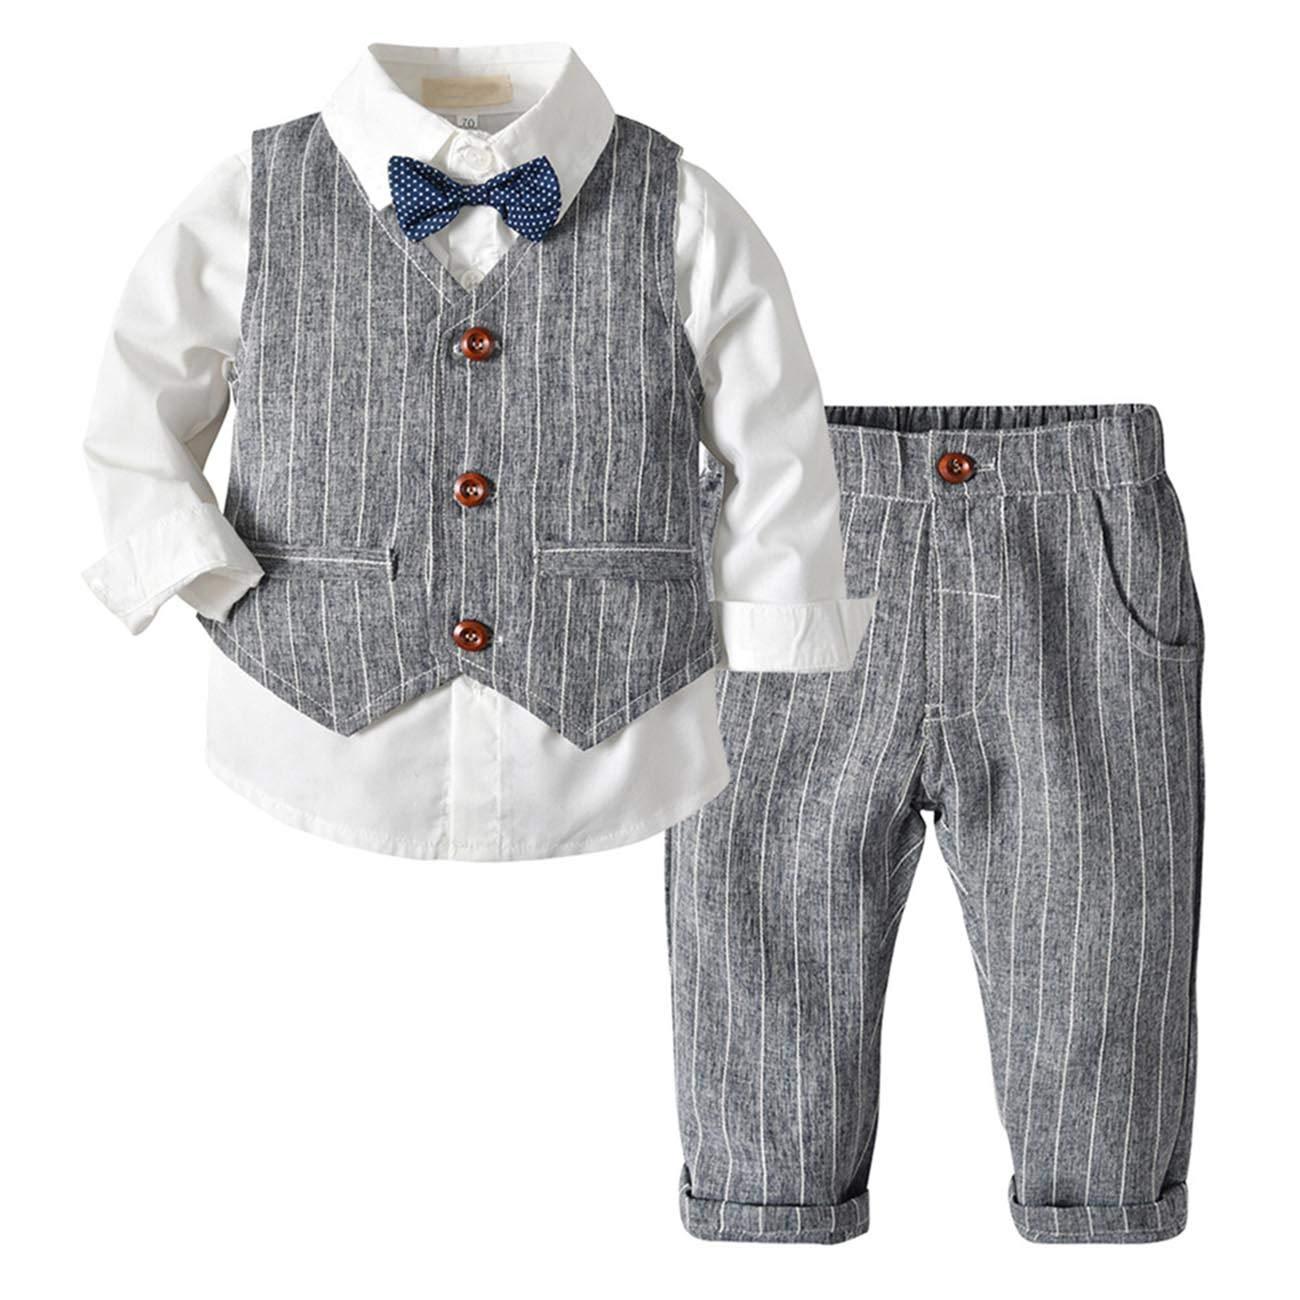 ec3aba055 XINXINHAIHE Little Kid Boy Formal Cotton Set 3pcs Long Sleeve Shirt+Vest+ Pants: Amazon.ca: Clothing & Accessories